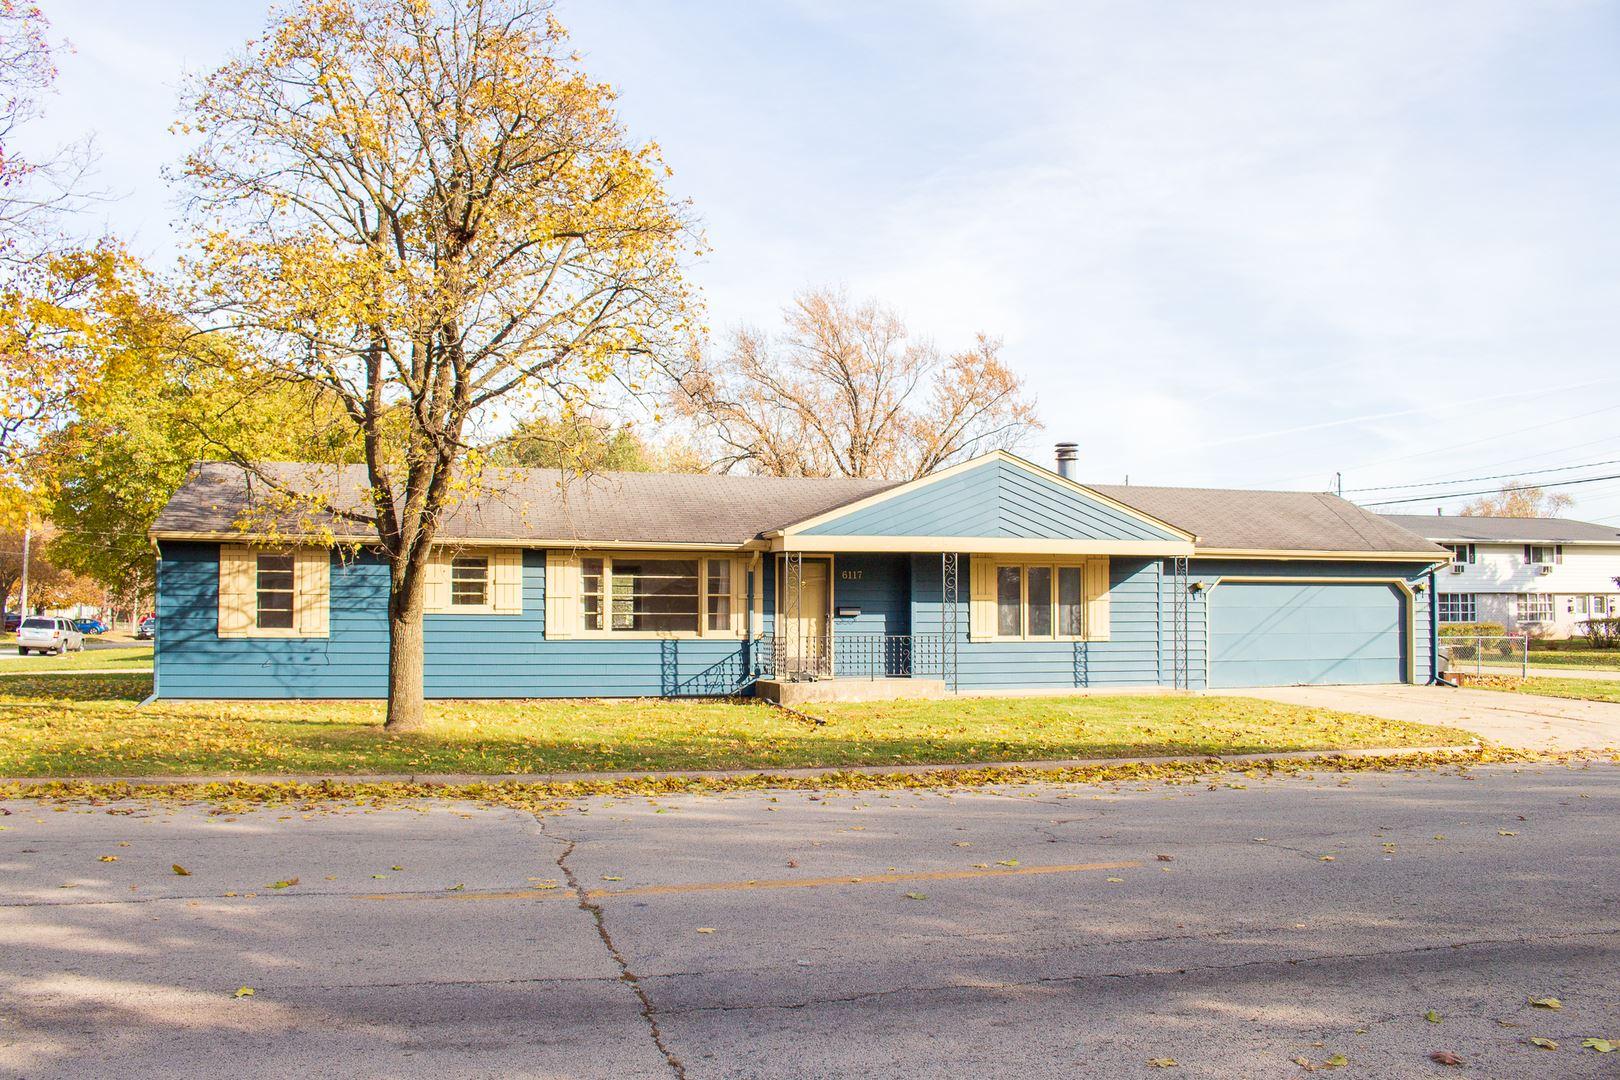 6117 East Drive, Loves Park, IL 61111 - #: 10924302